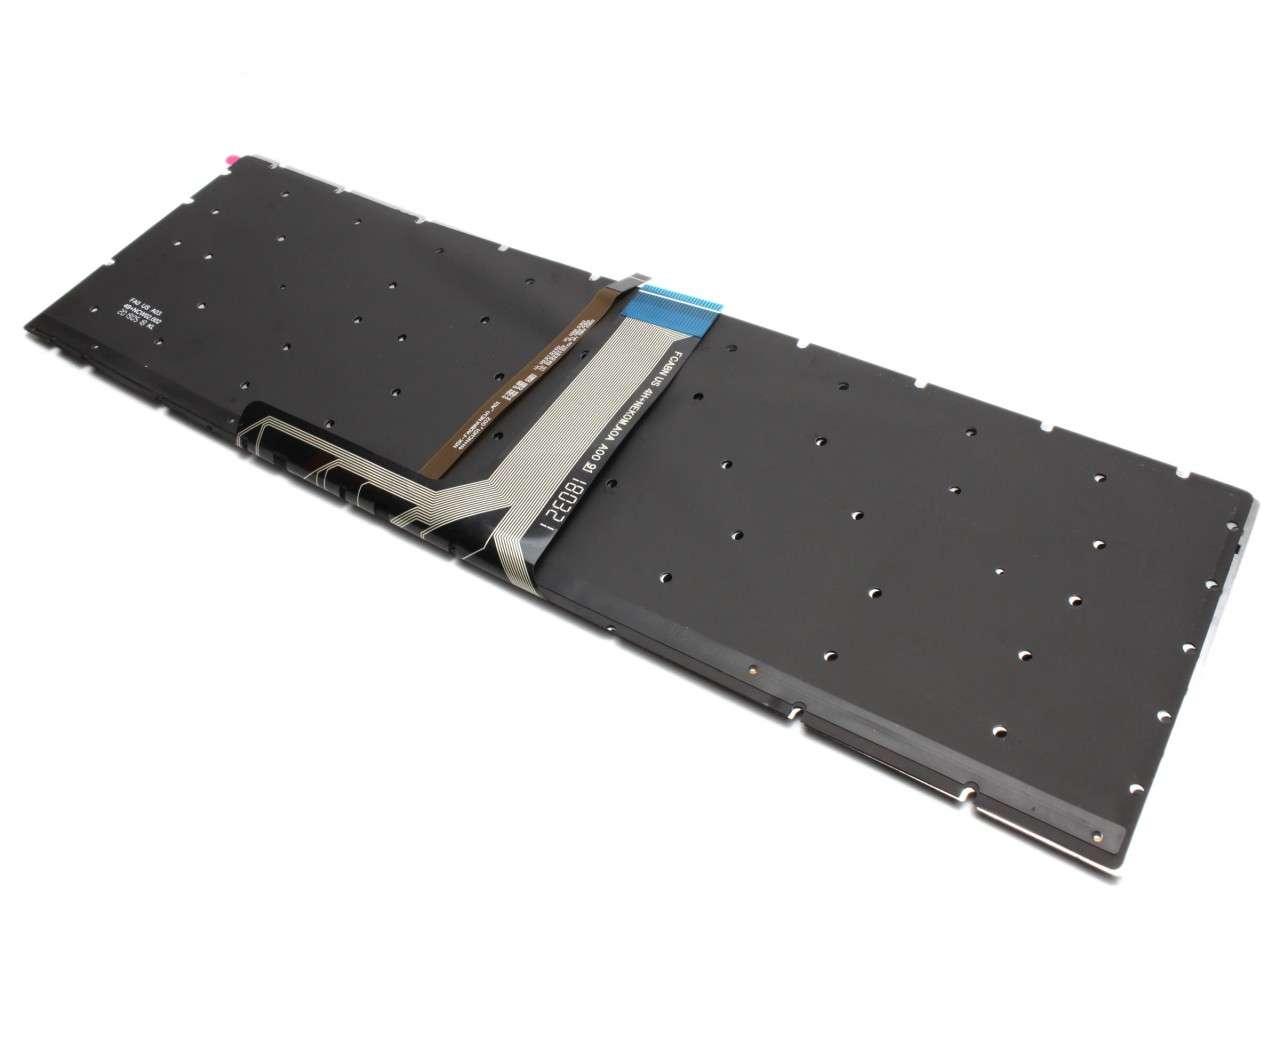 Tastatura MSI 9Z.NCXBN.11D iluminata layout US fara rama enter mic imagine powerlaptop.ro 2021